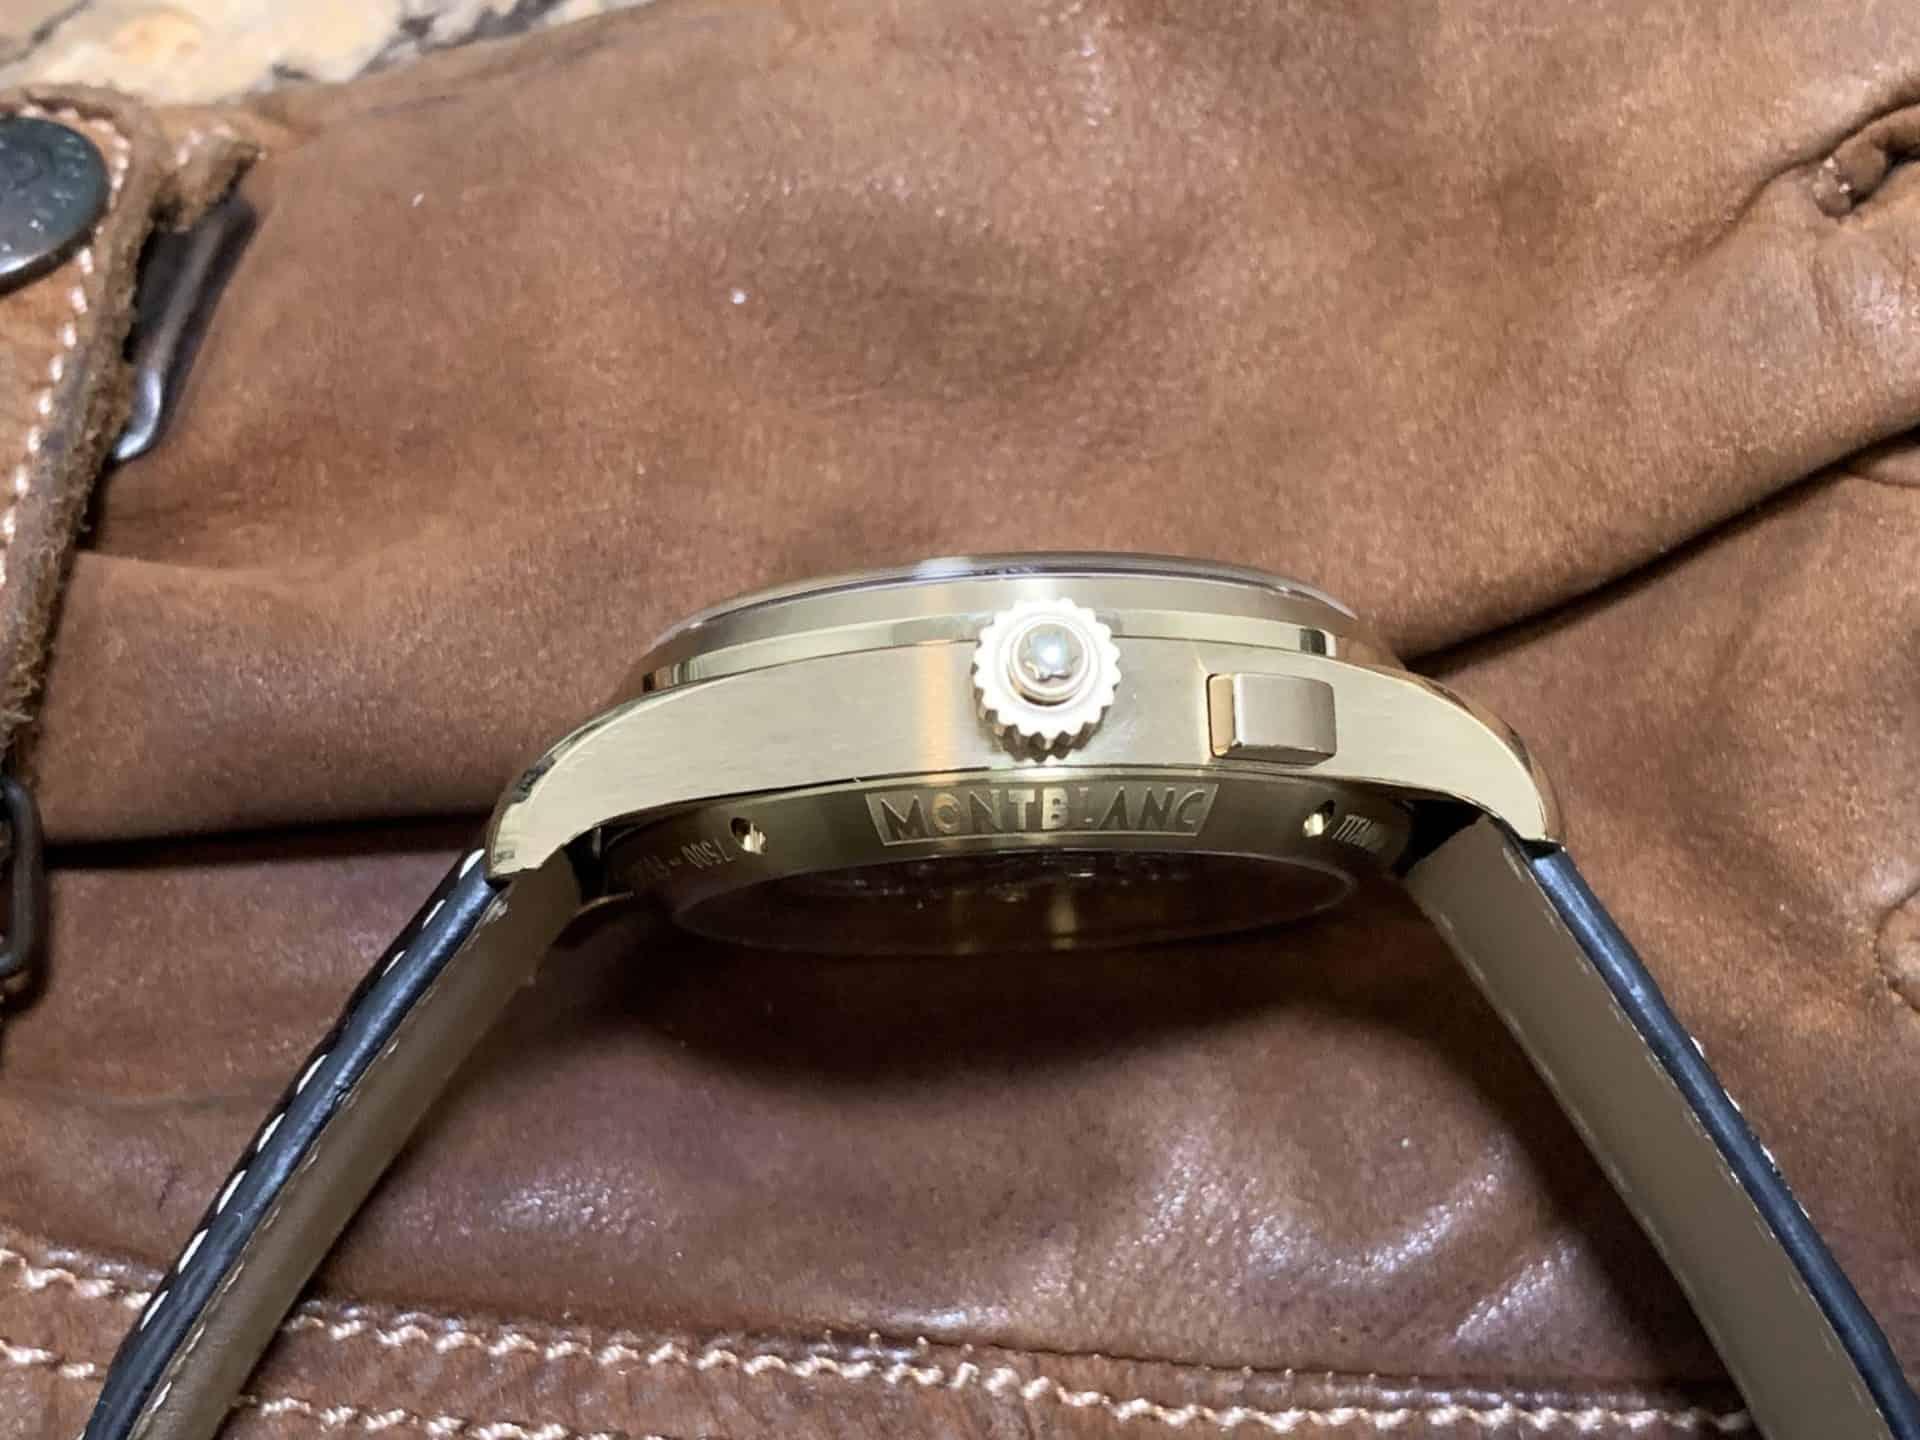 Montblanc_1858_Chronograph Rattrapante_04_Foto GLB